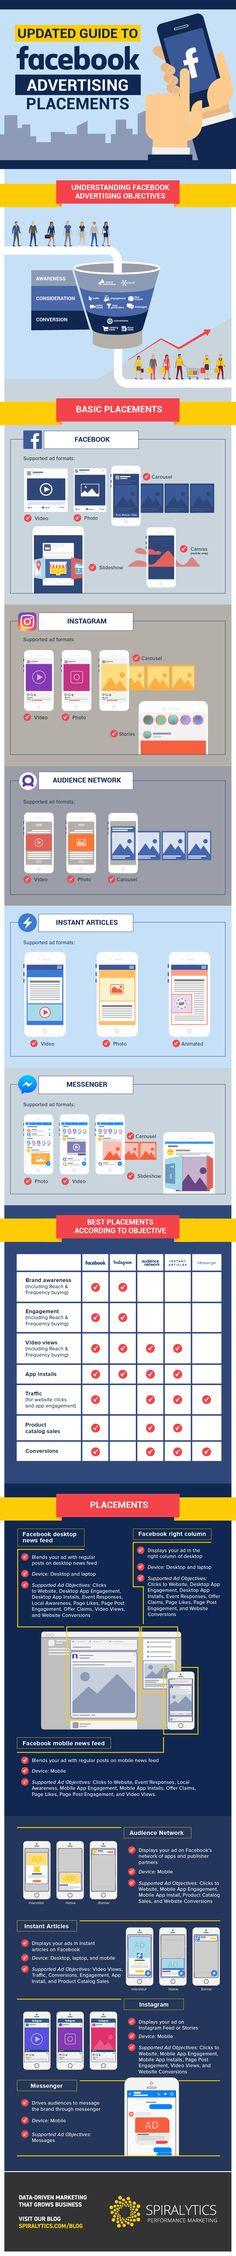 Infographic Courtesy of: Facebook Marketing, Business Marketing, Online Marketing, Social Media Marketing, Digital Marketing, Marketing Ideas, Online Advertising, Marketing Strategies, Advertising Campaign